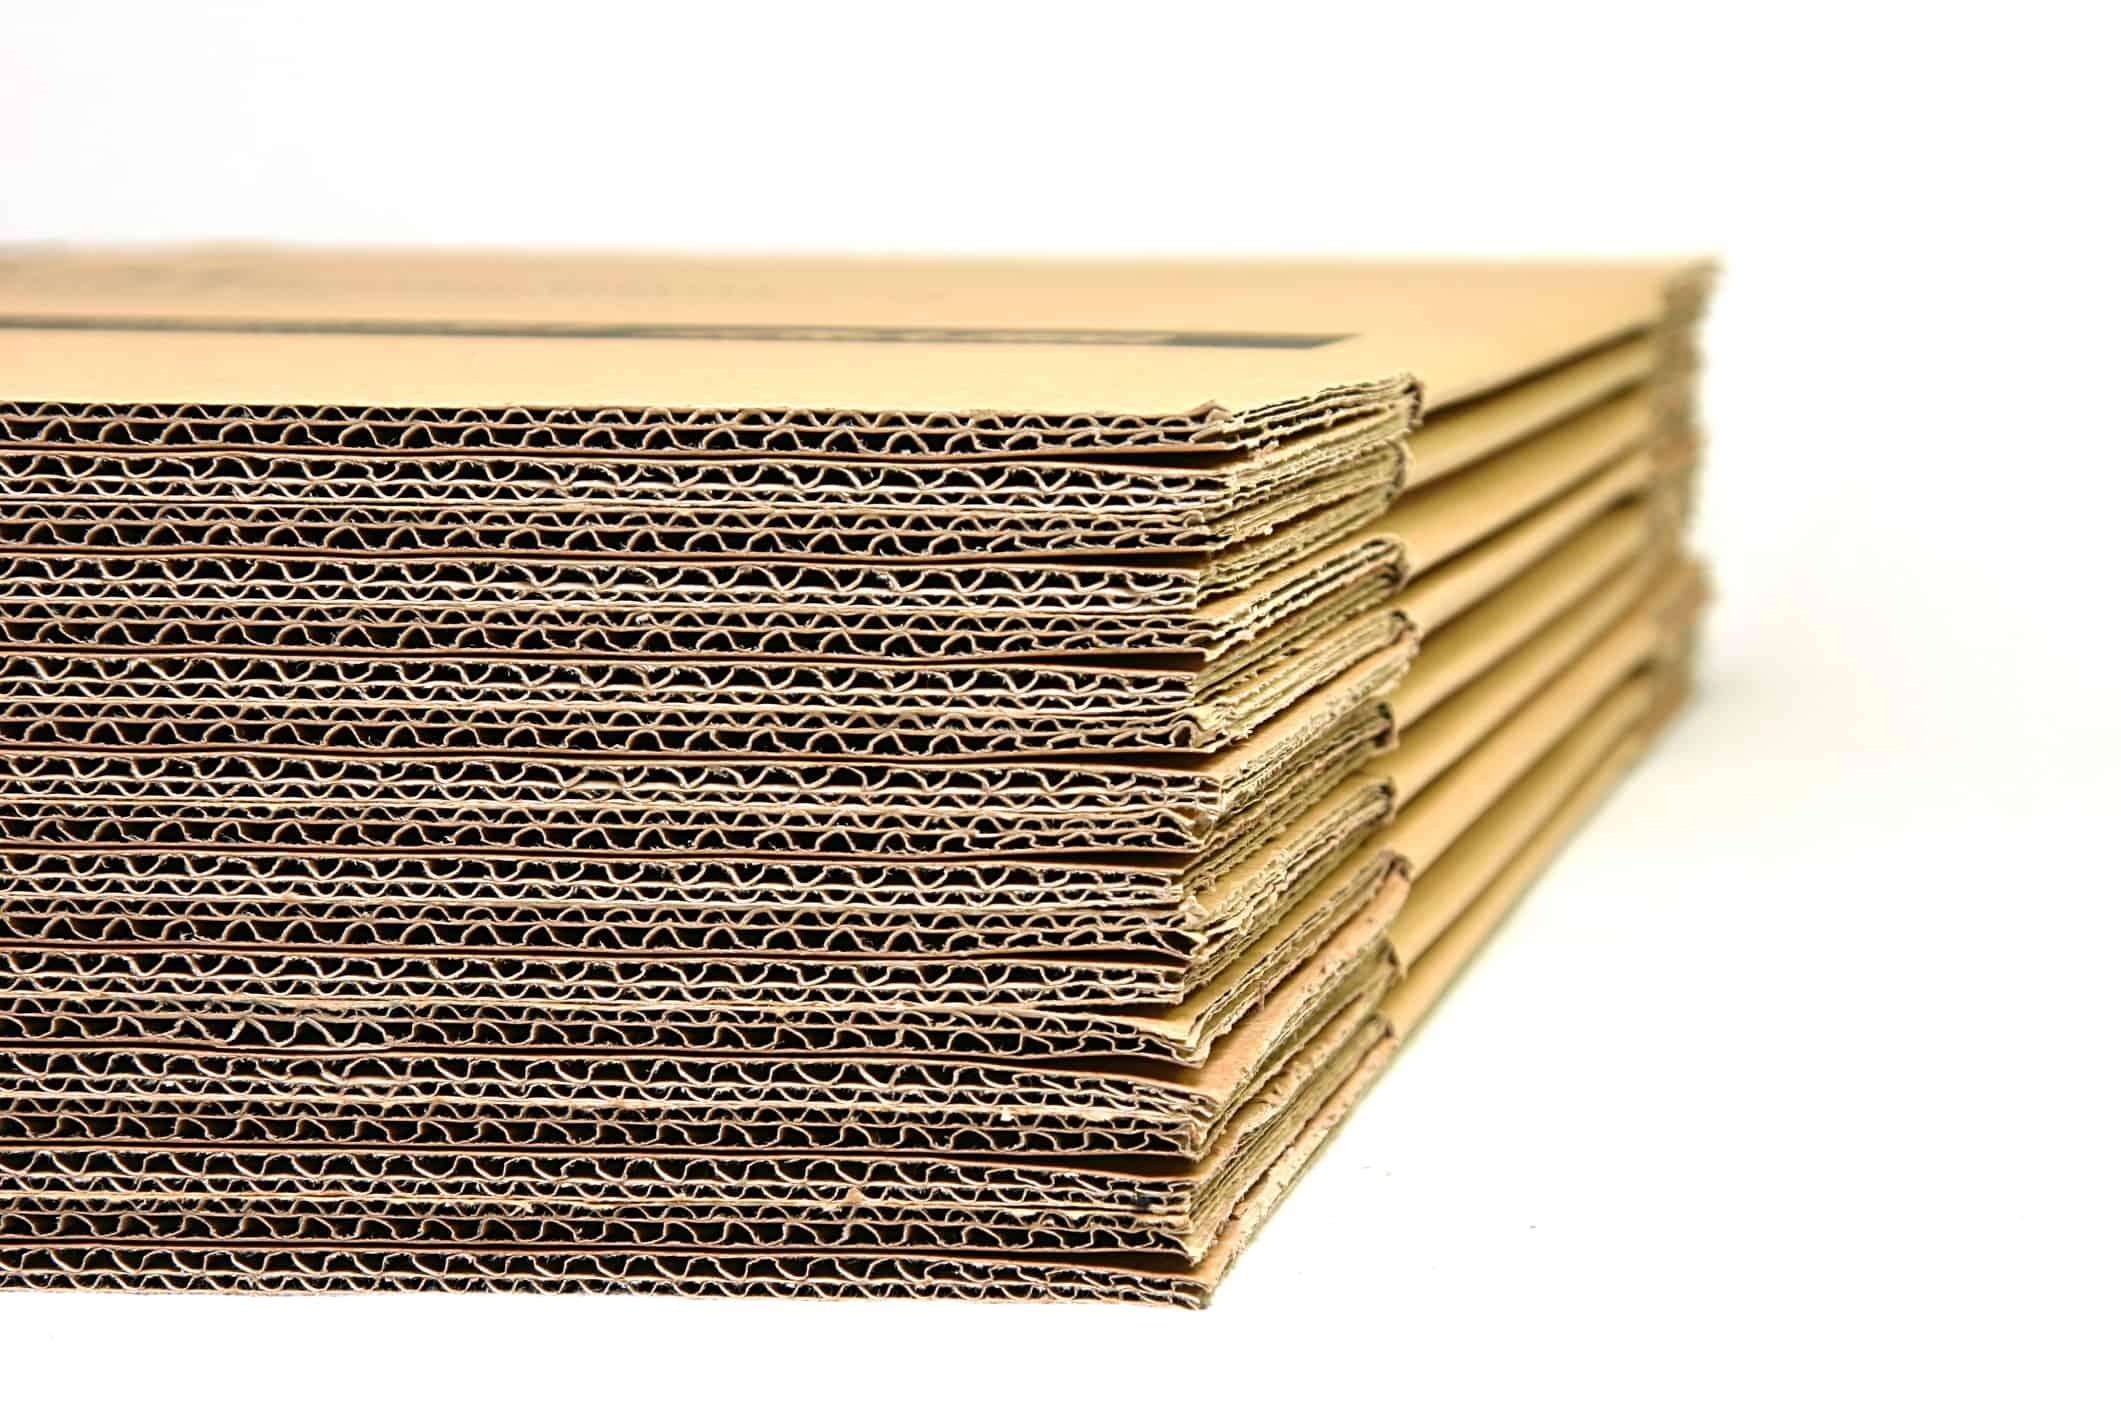 flatpack cardboard boxes